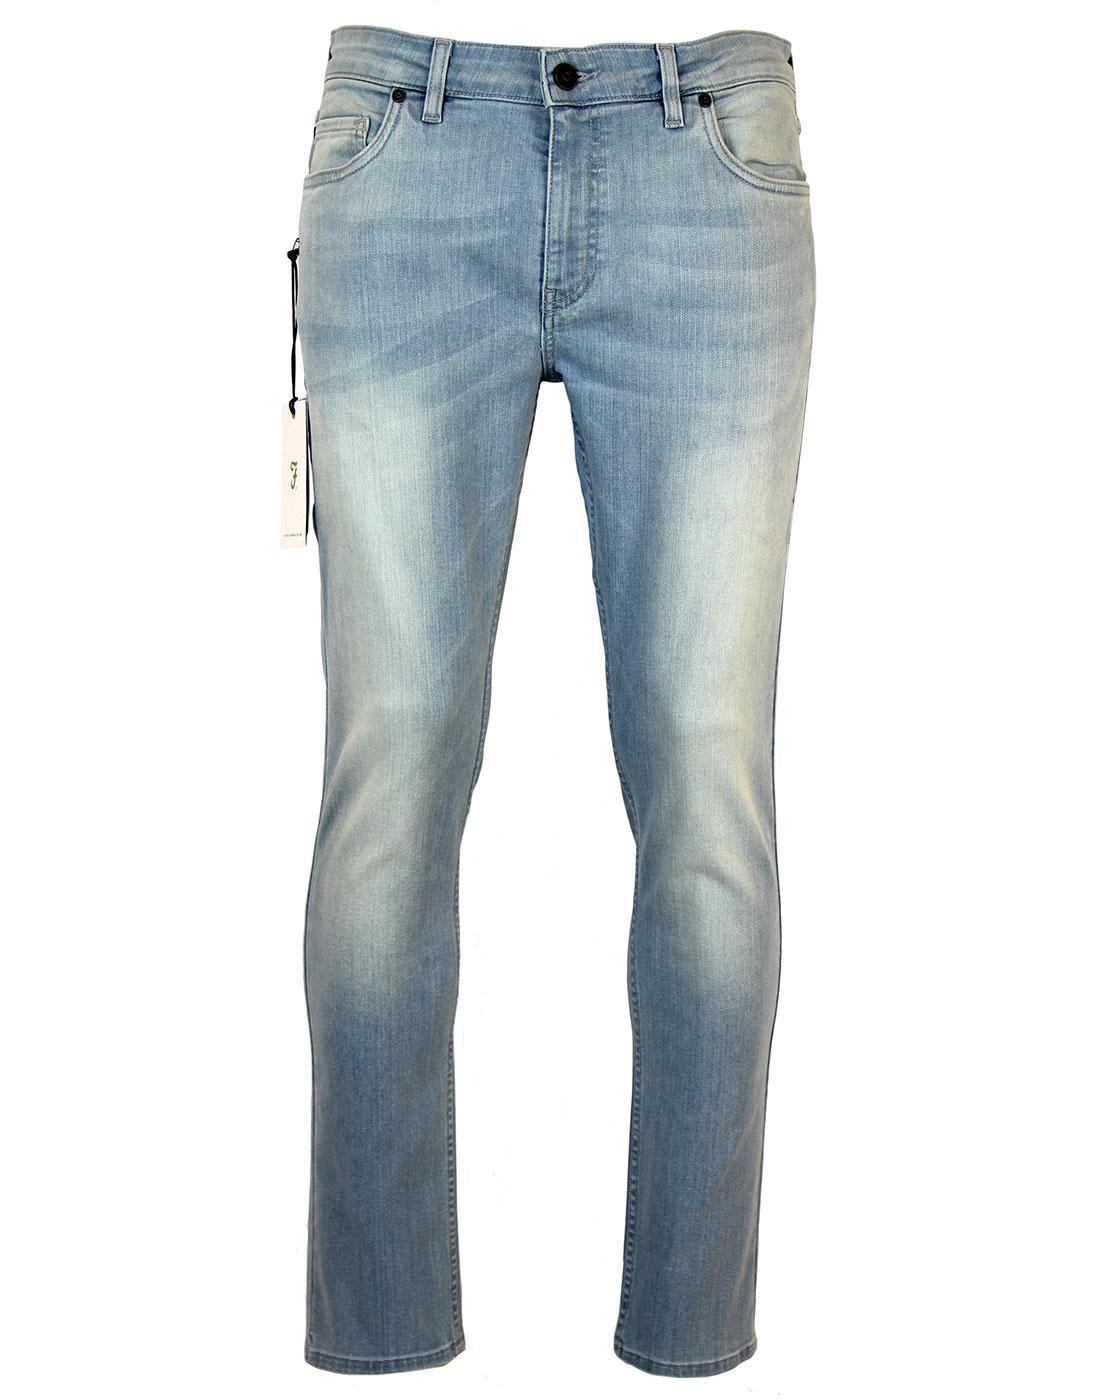 Drake FARAH Retro Mod Drainpipe Denim Jeans